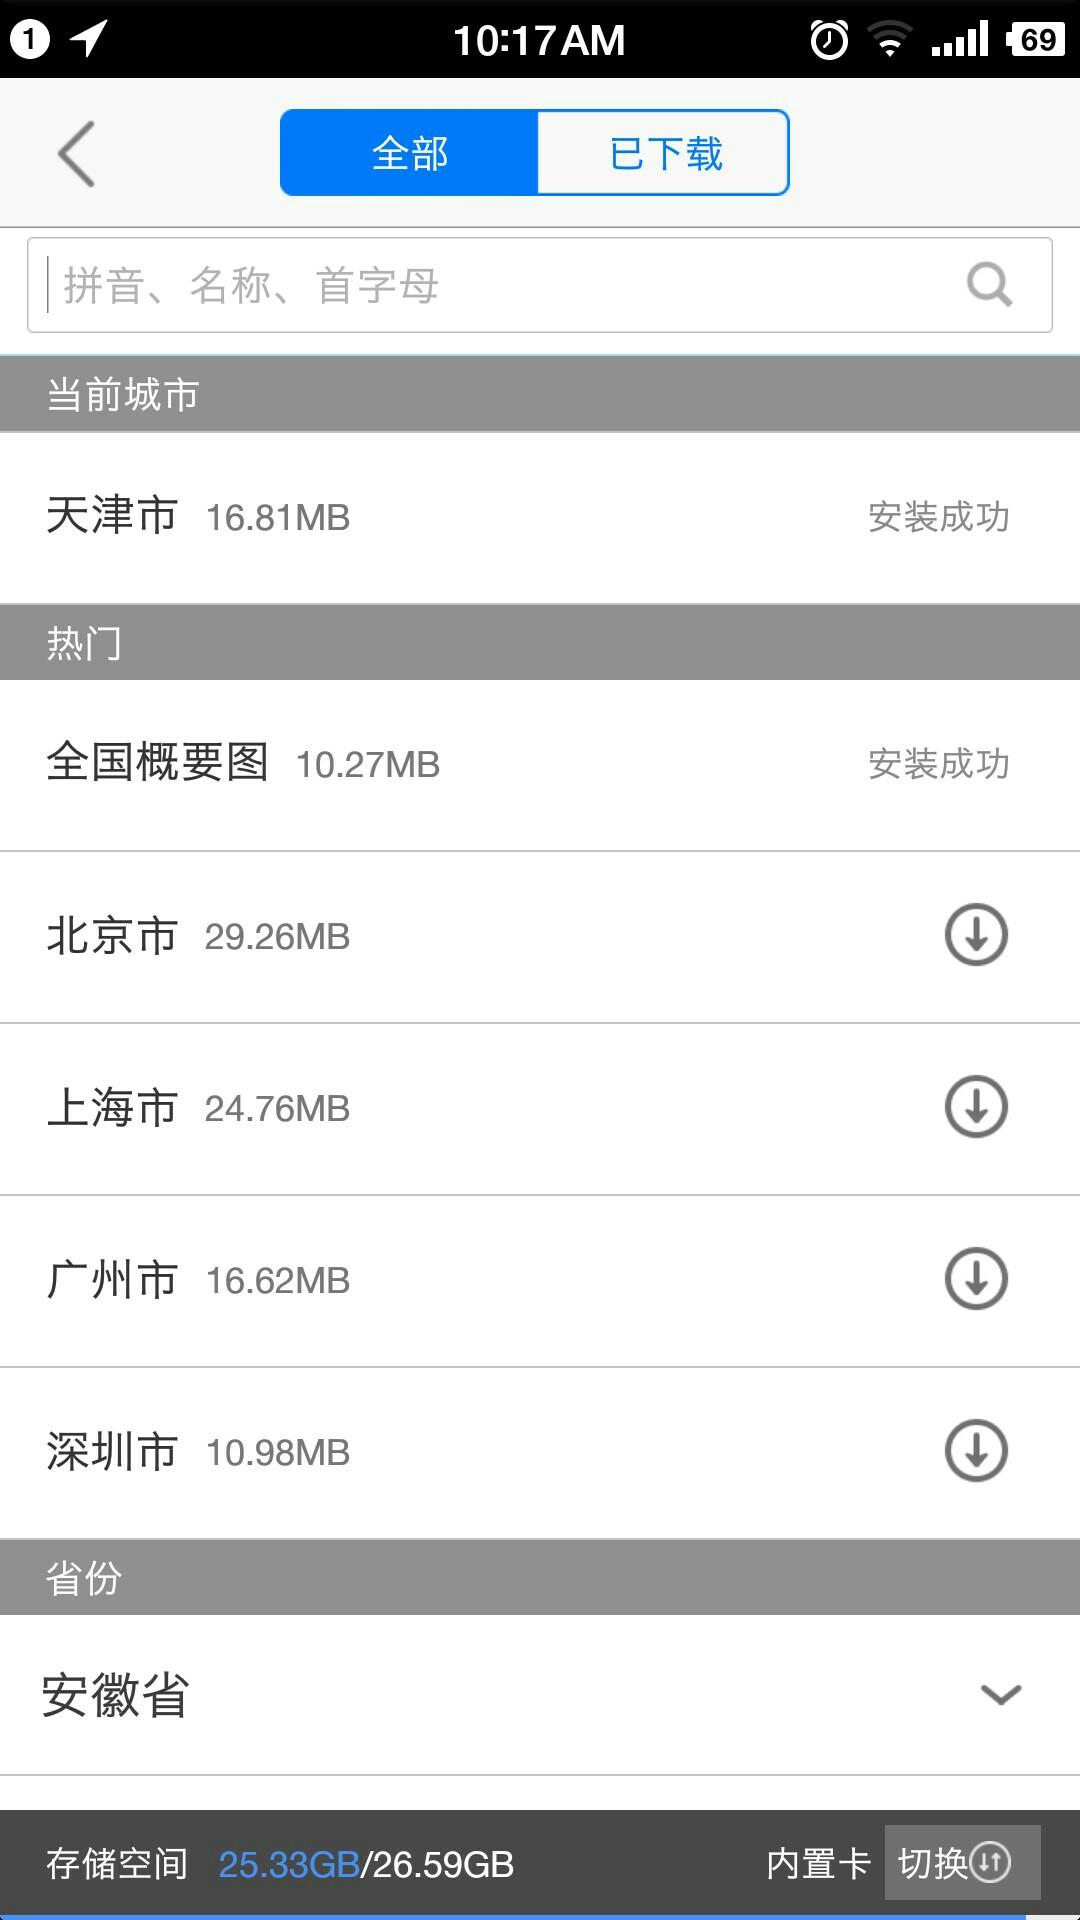 Screenshot_2016-06-16-10-17-25-747_????.png